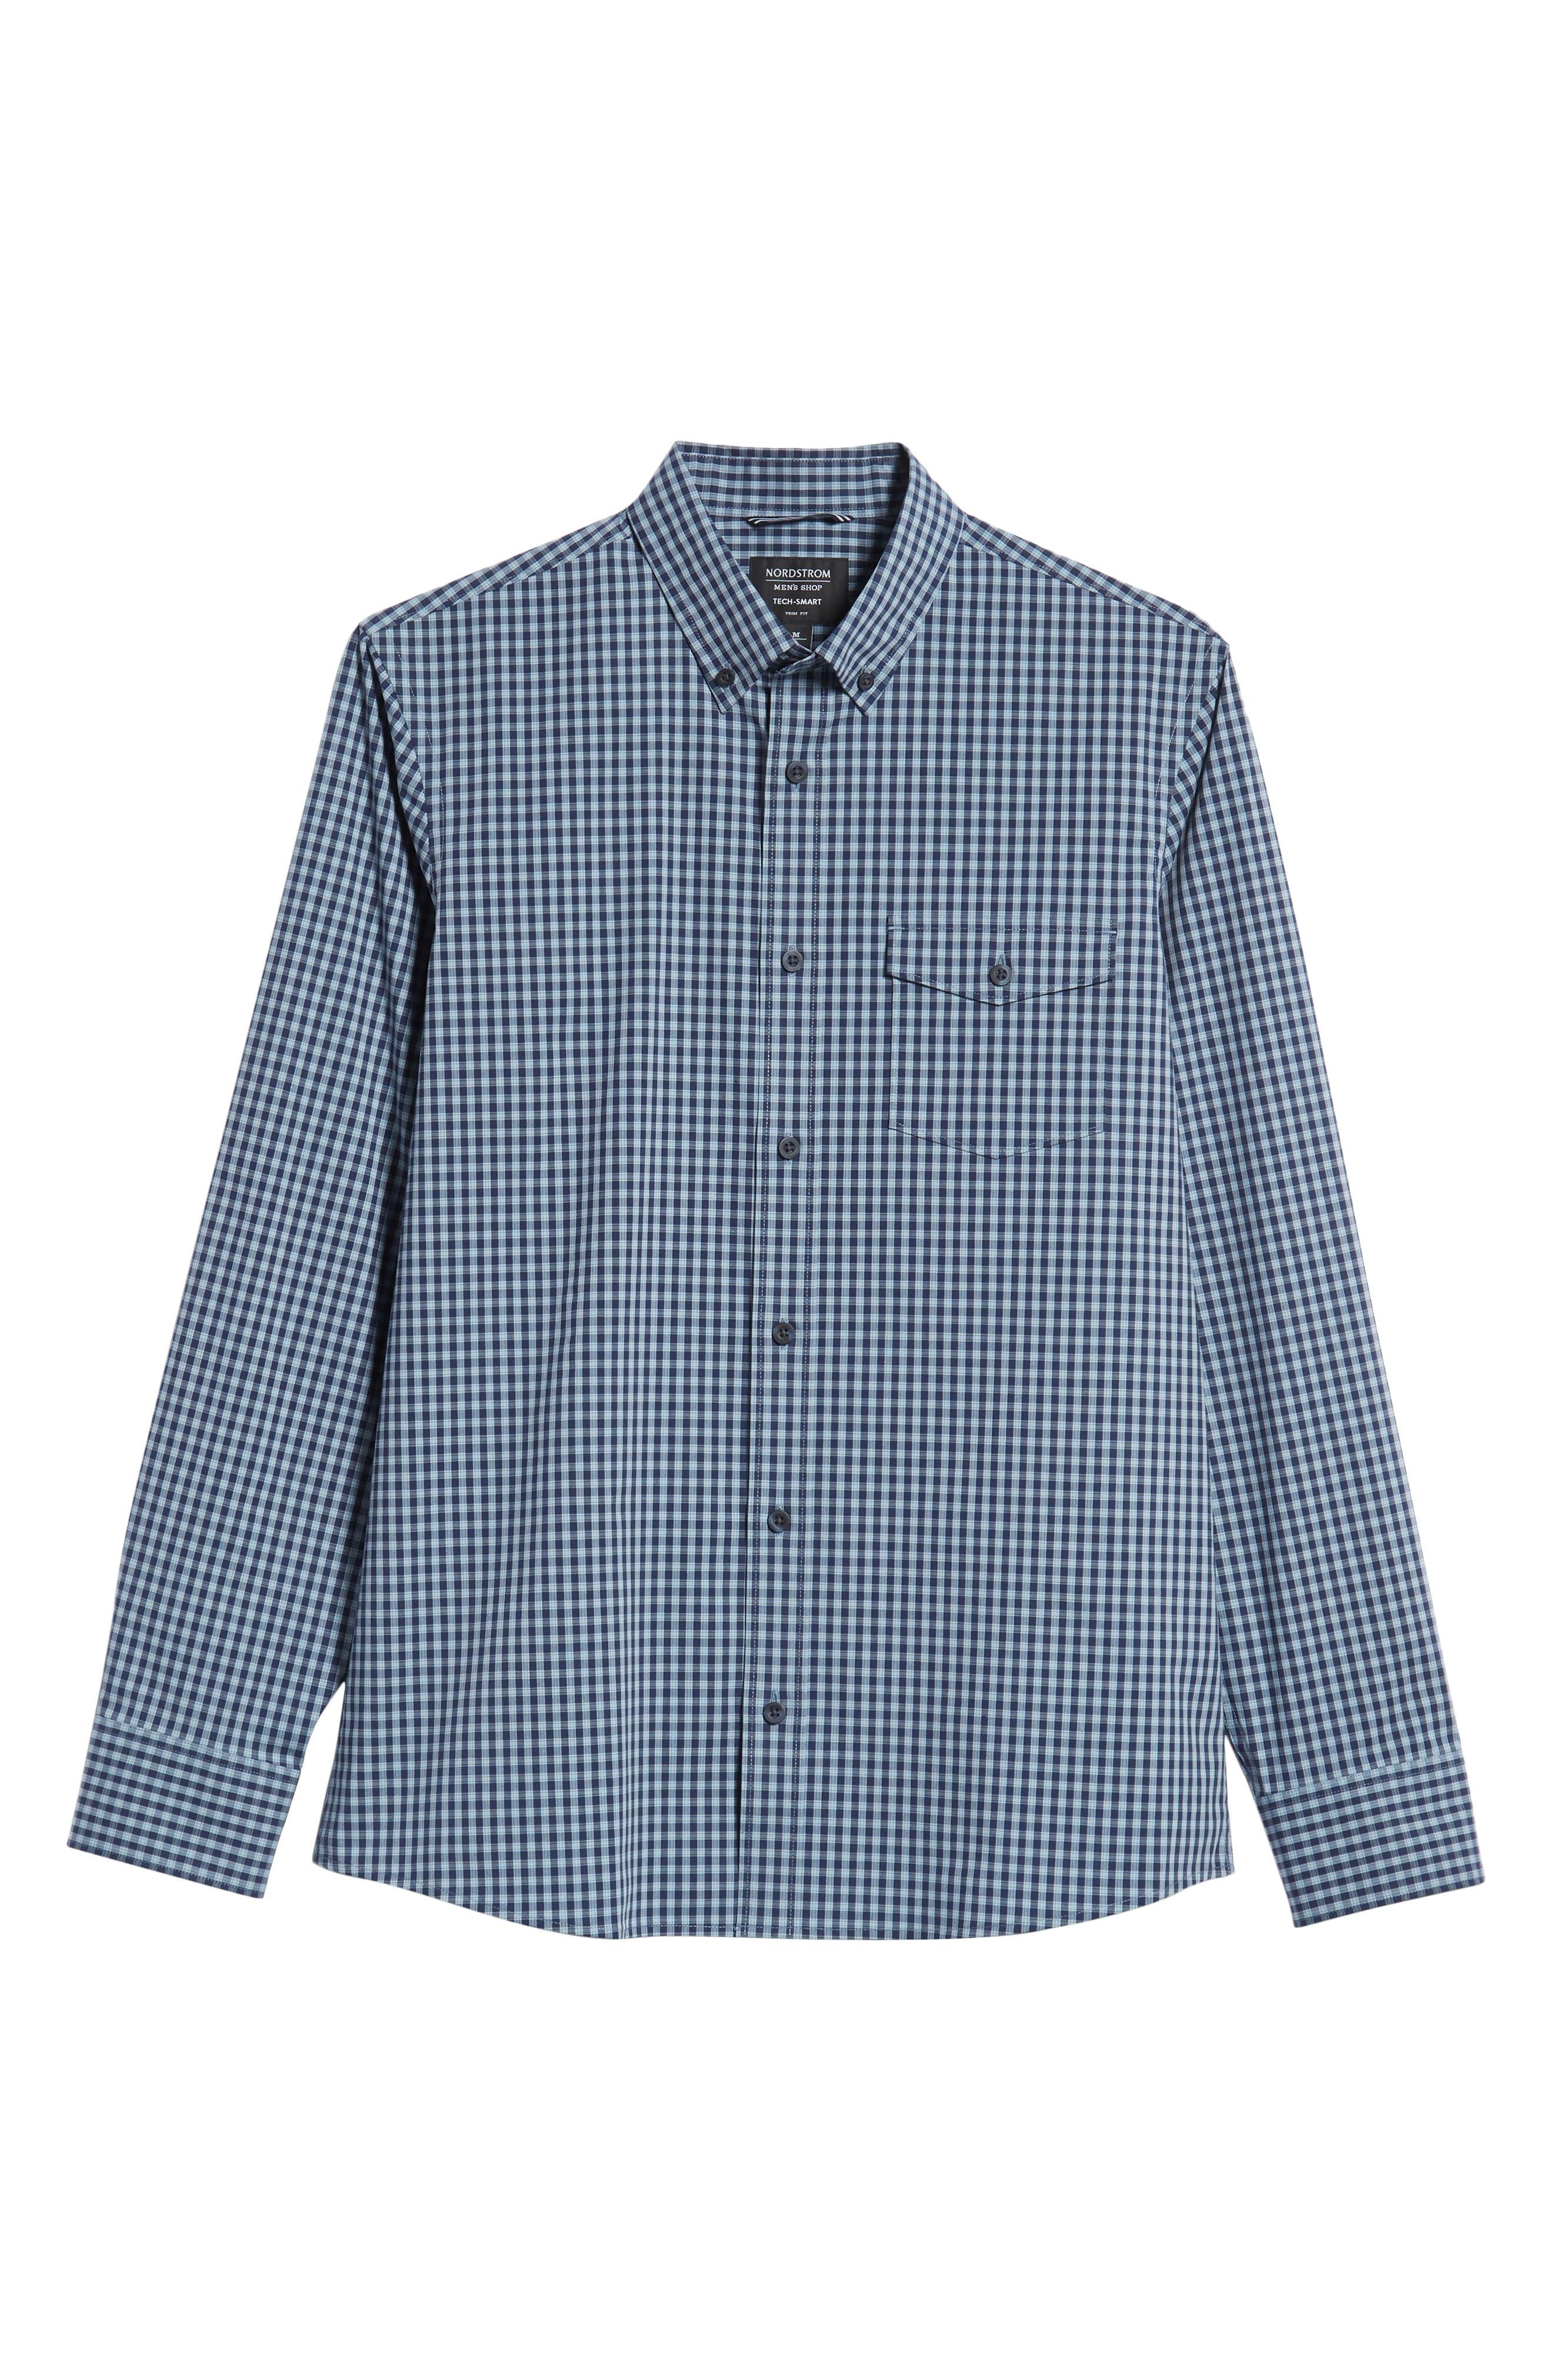 Tech-Smart Slim Fit Check Sport Shirt,                             Alternate thumbnail 5, color,                             NAVY NIGHT BLUE CHECK